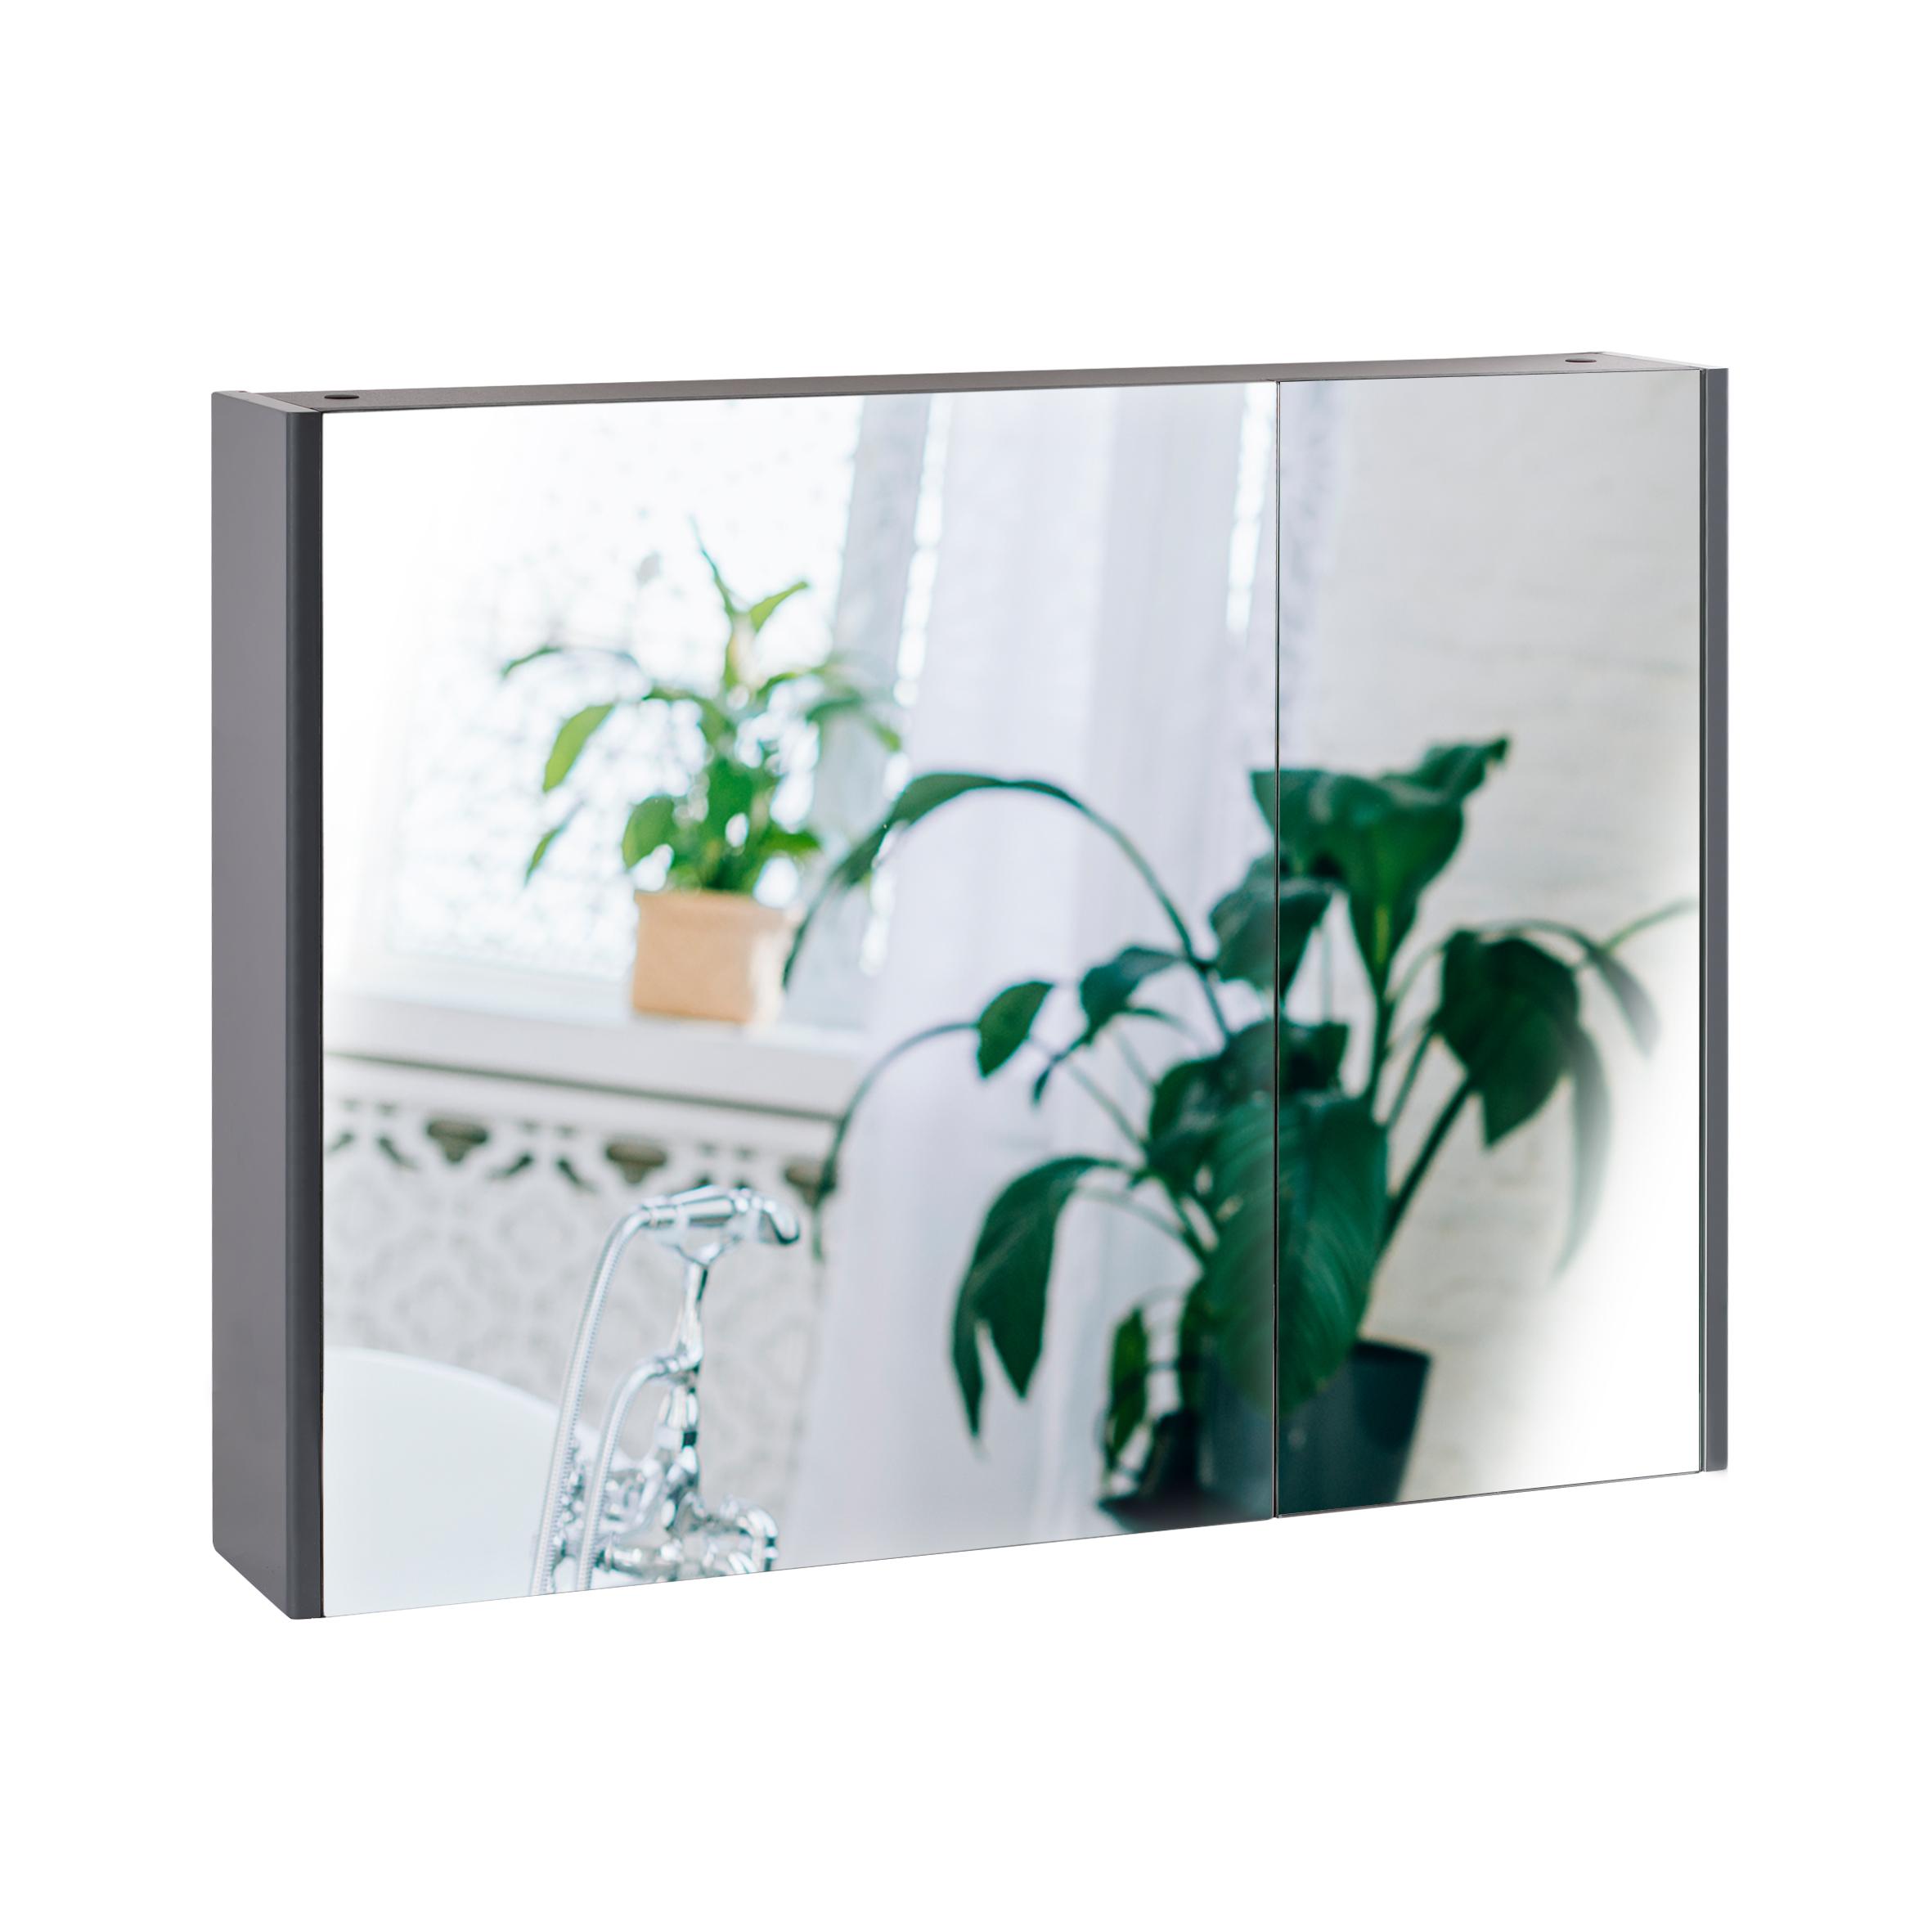 Зеркальный шкаф подвесной Qtap Scorpio 800х600 Graphite QT1477ZP802G